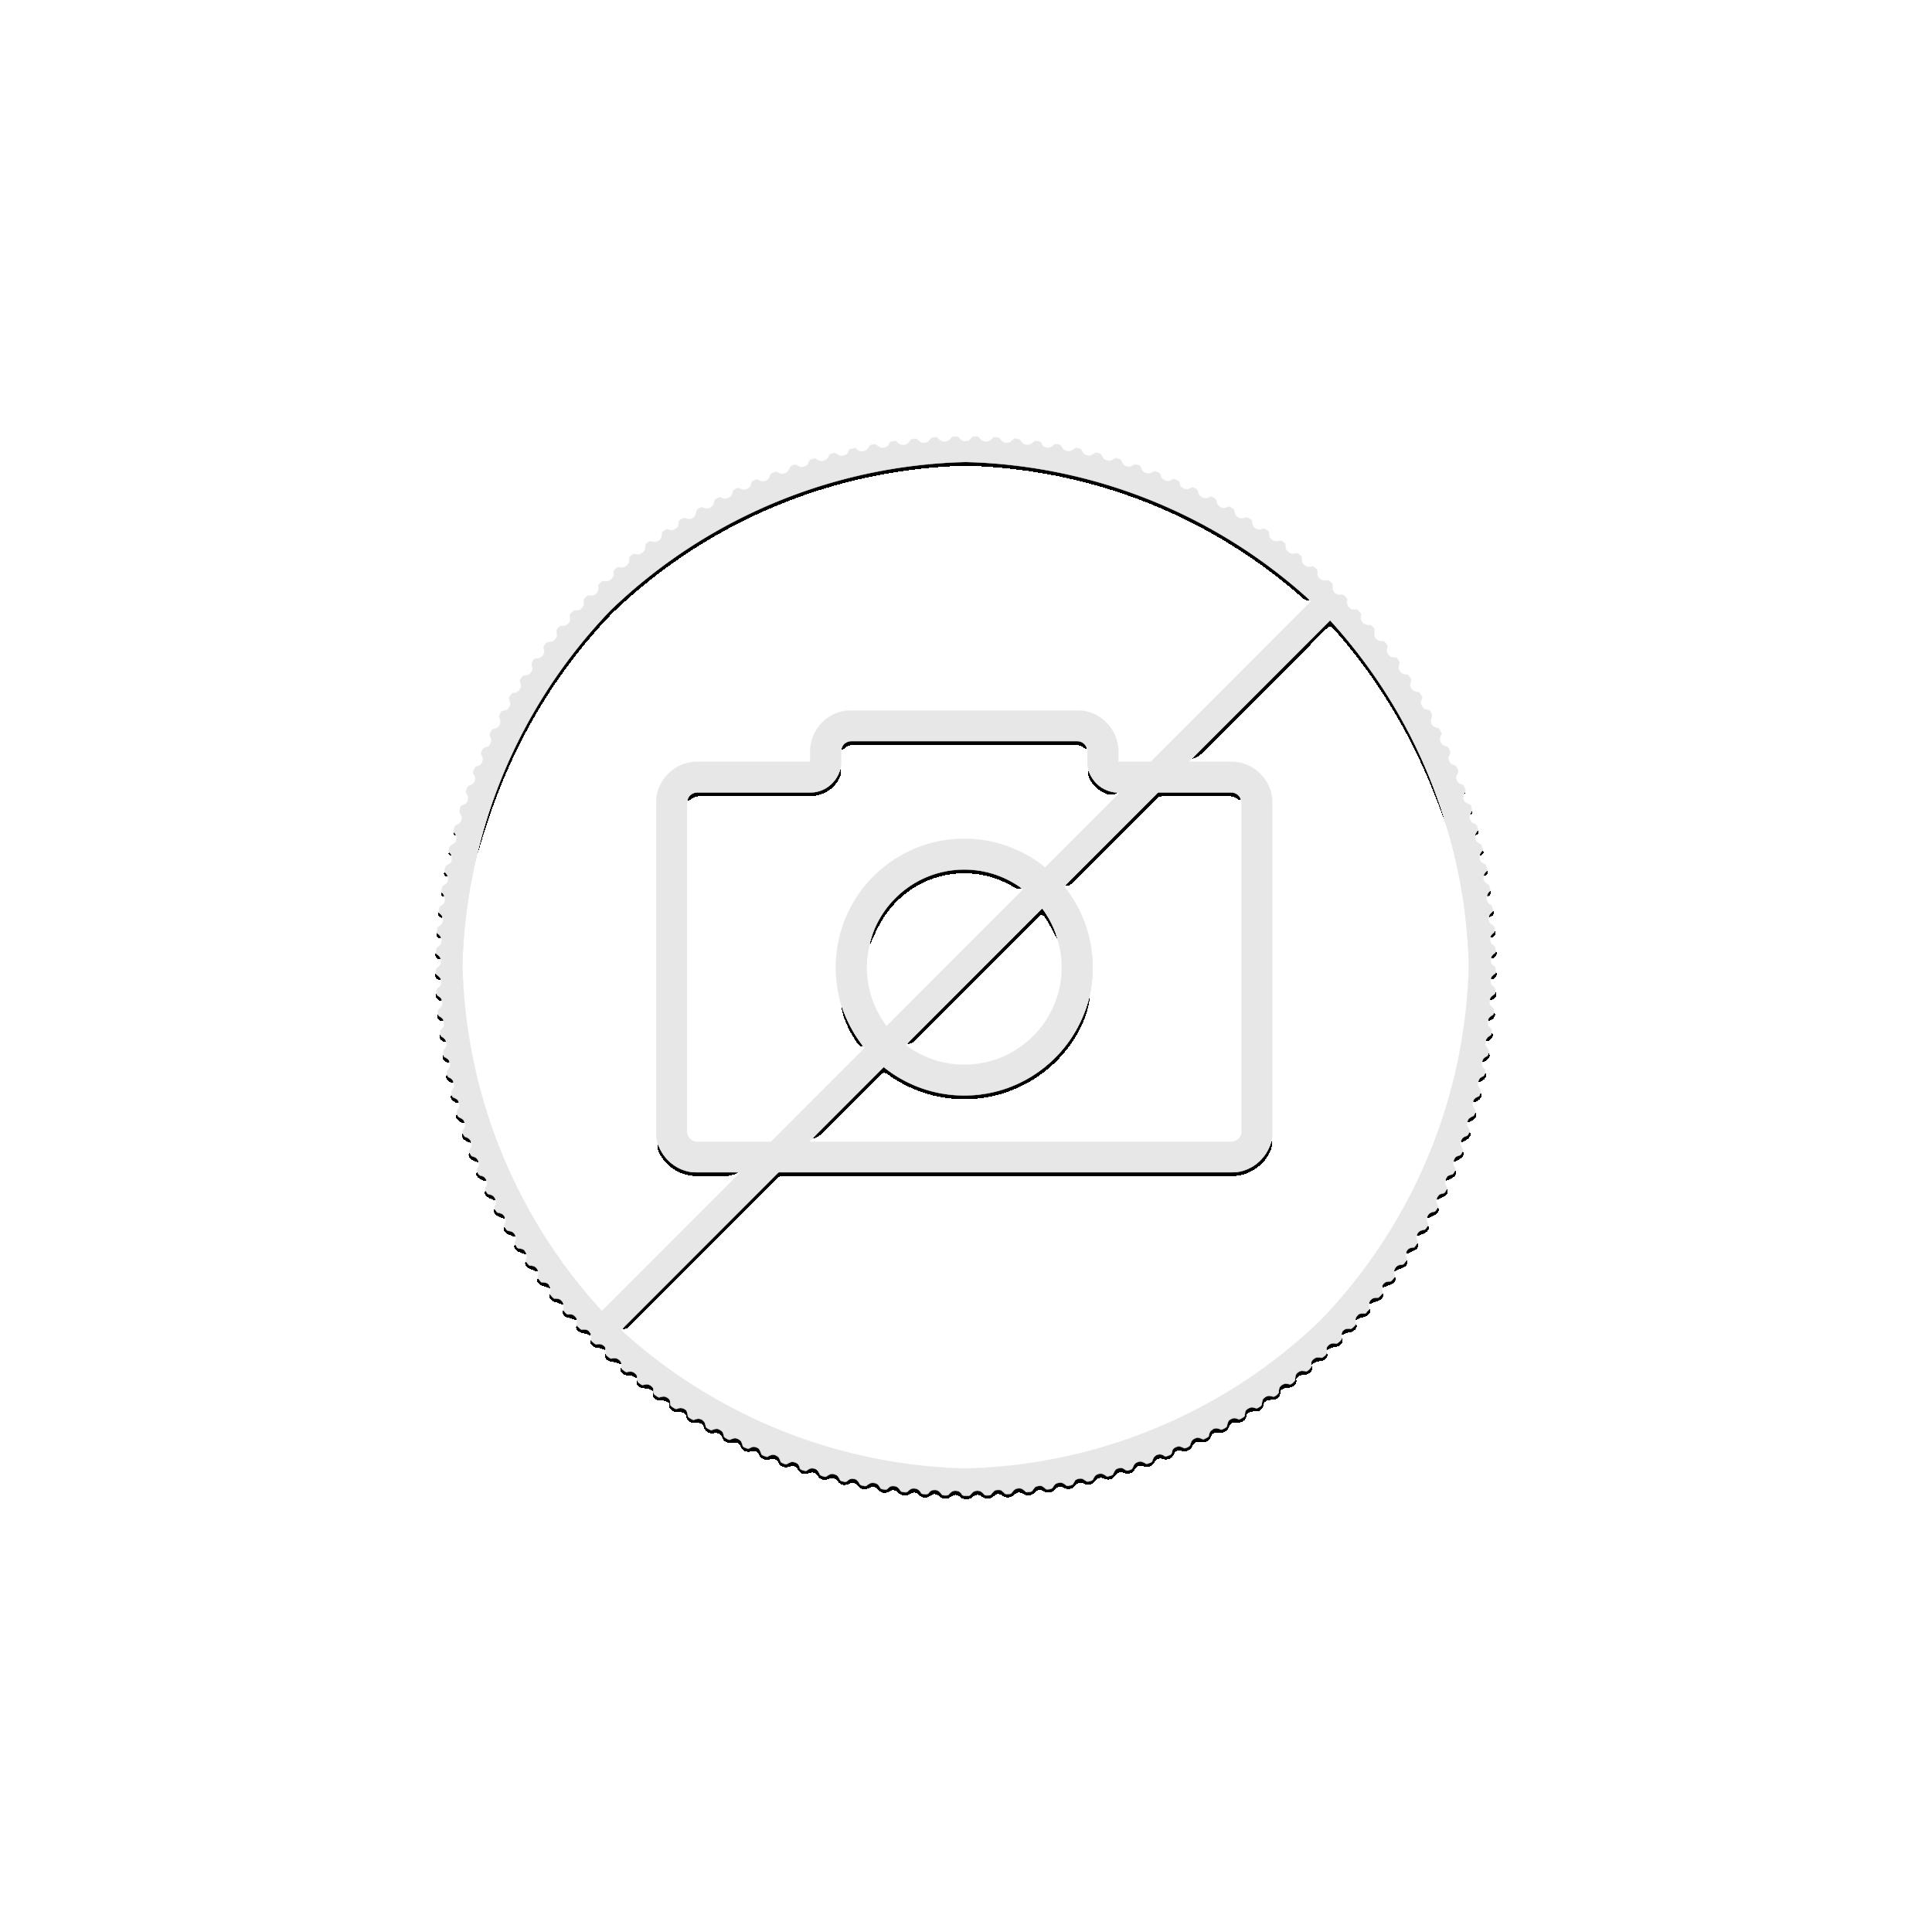 1 Troy ounce gouden munt Lunar 2020 Proof